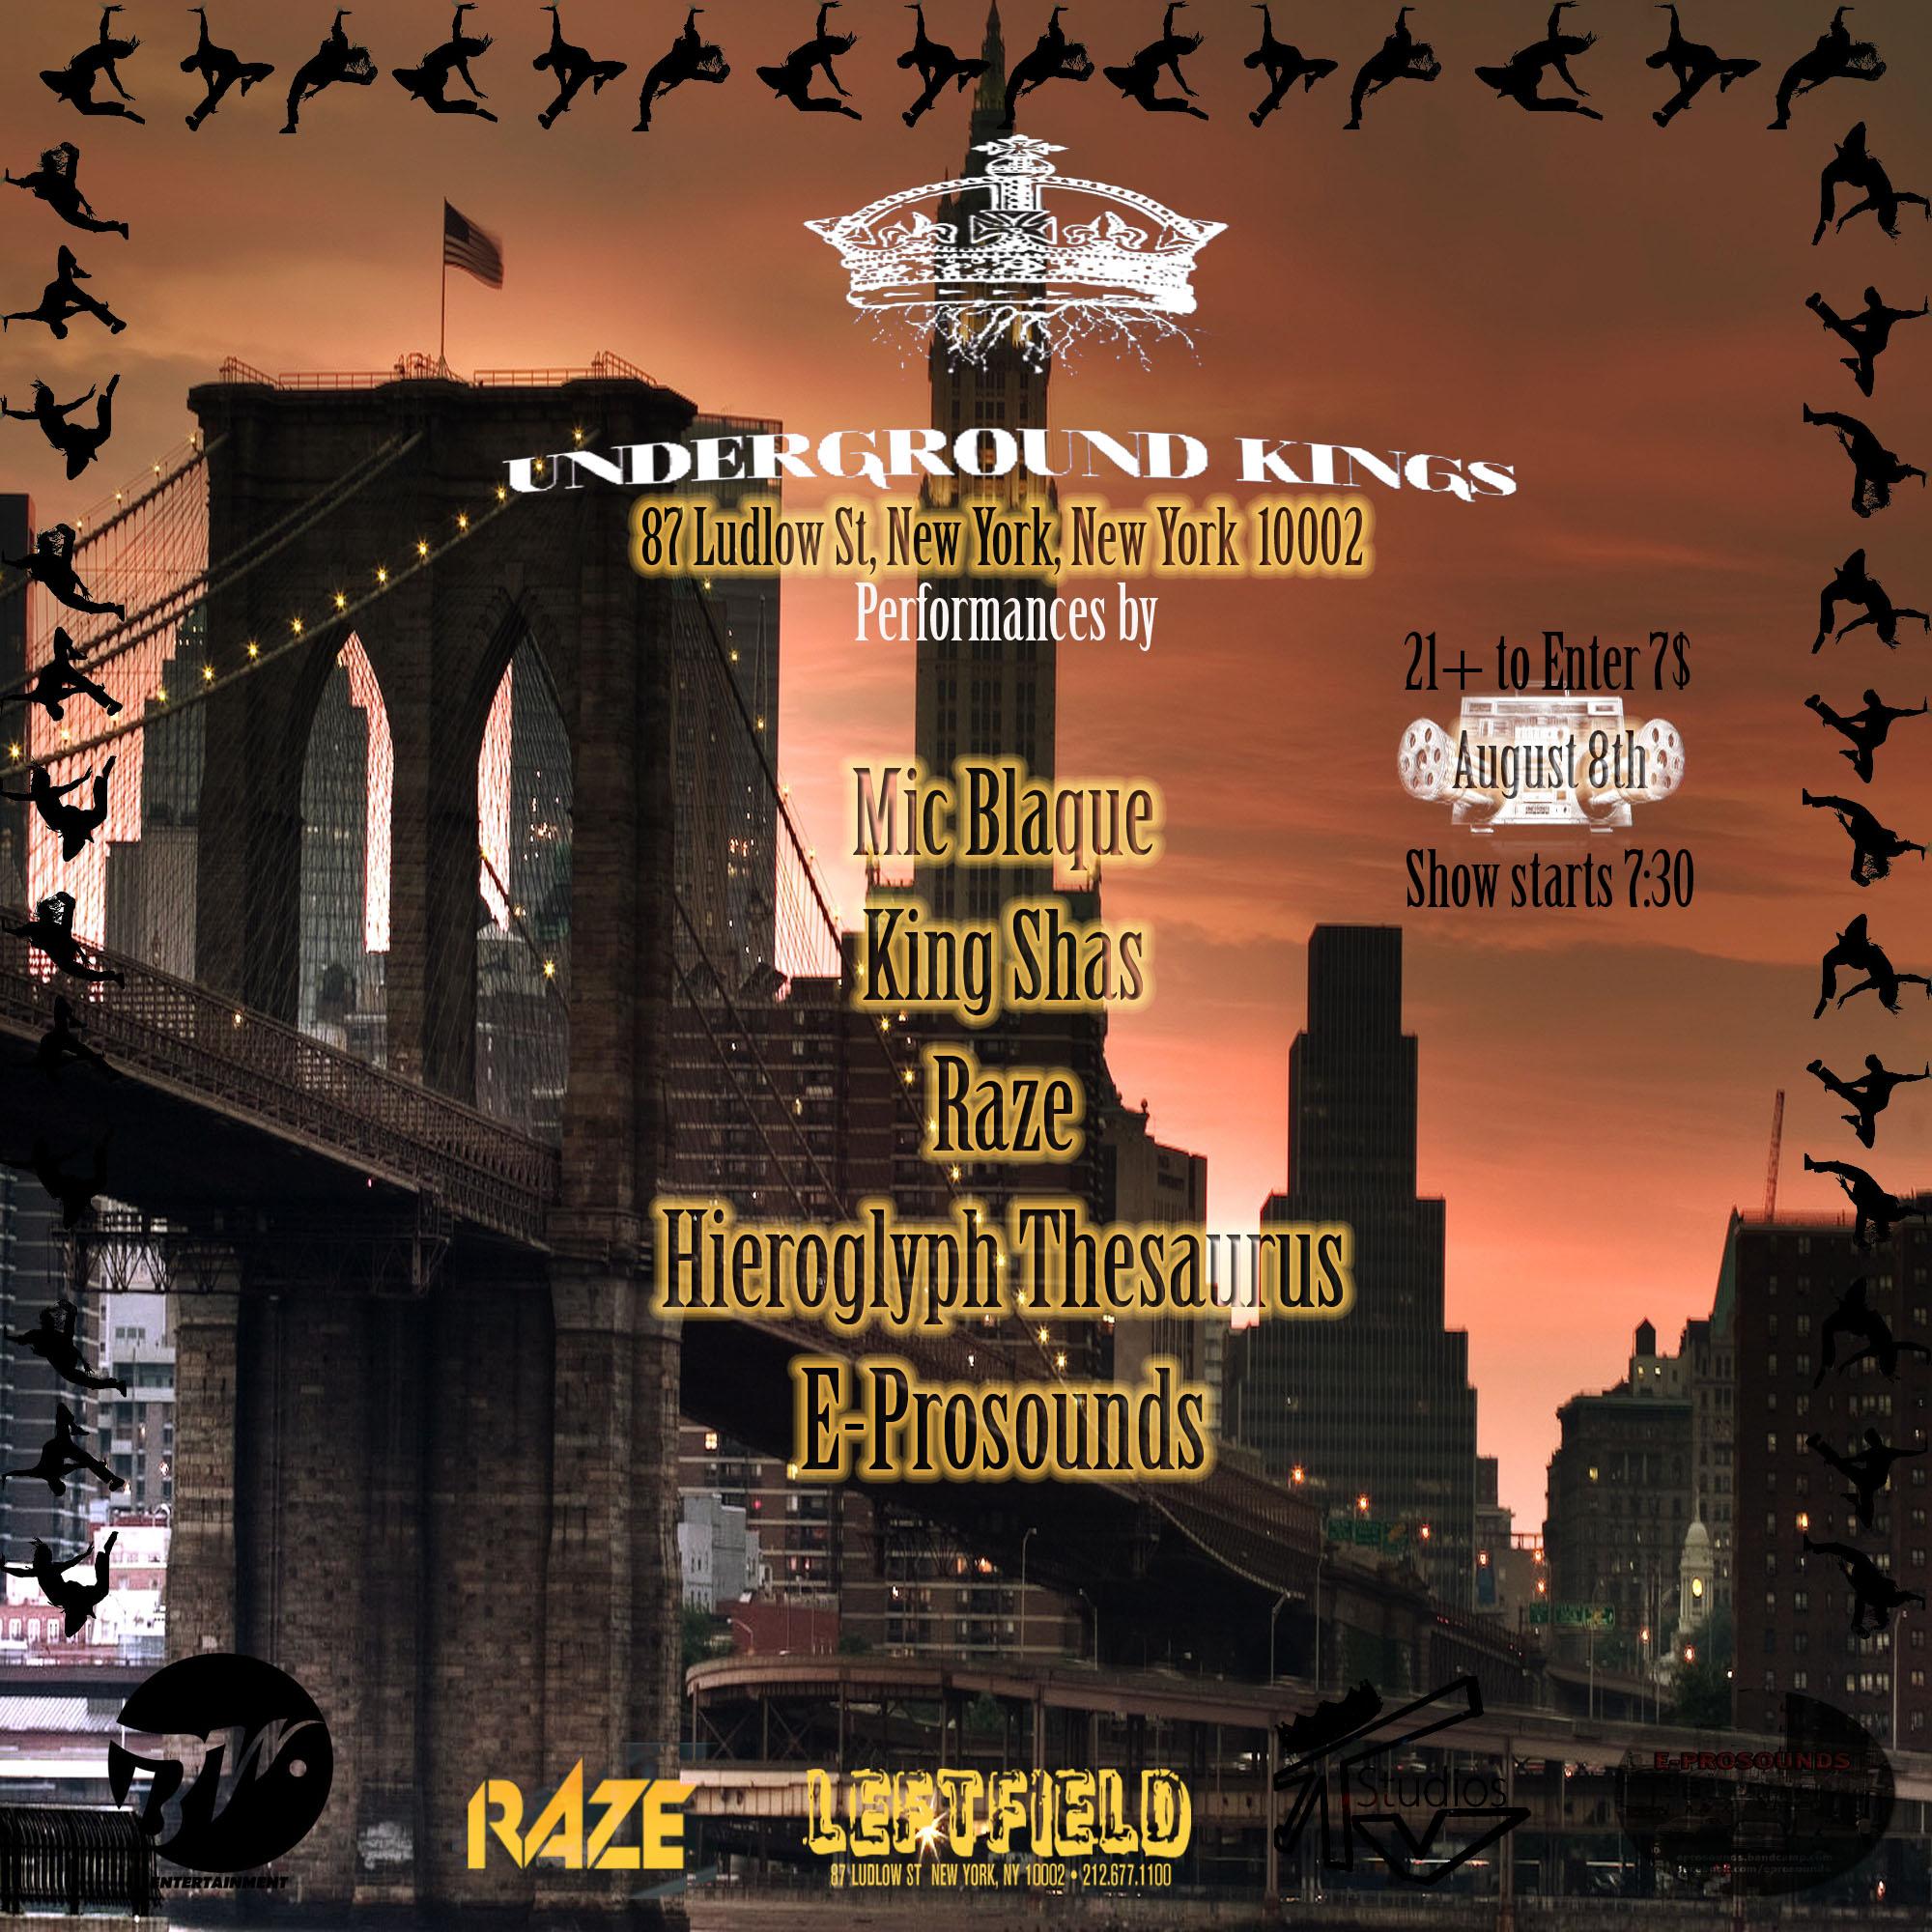 UNDERGROUND KINGS SHOW3.0 copy.jpg